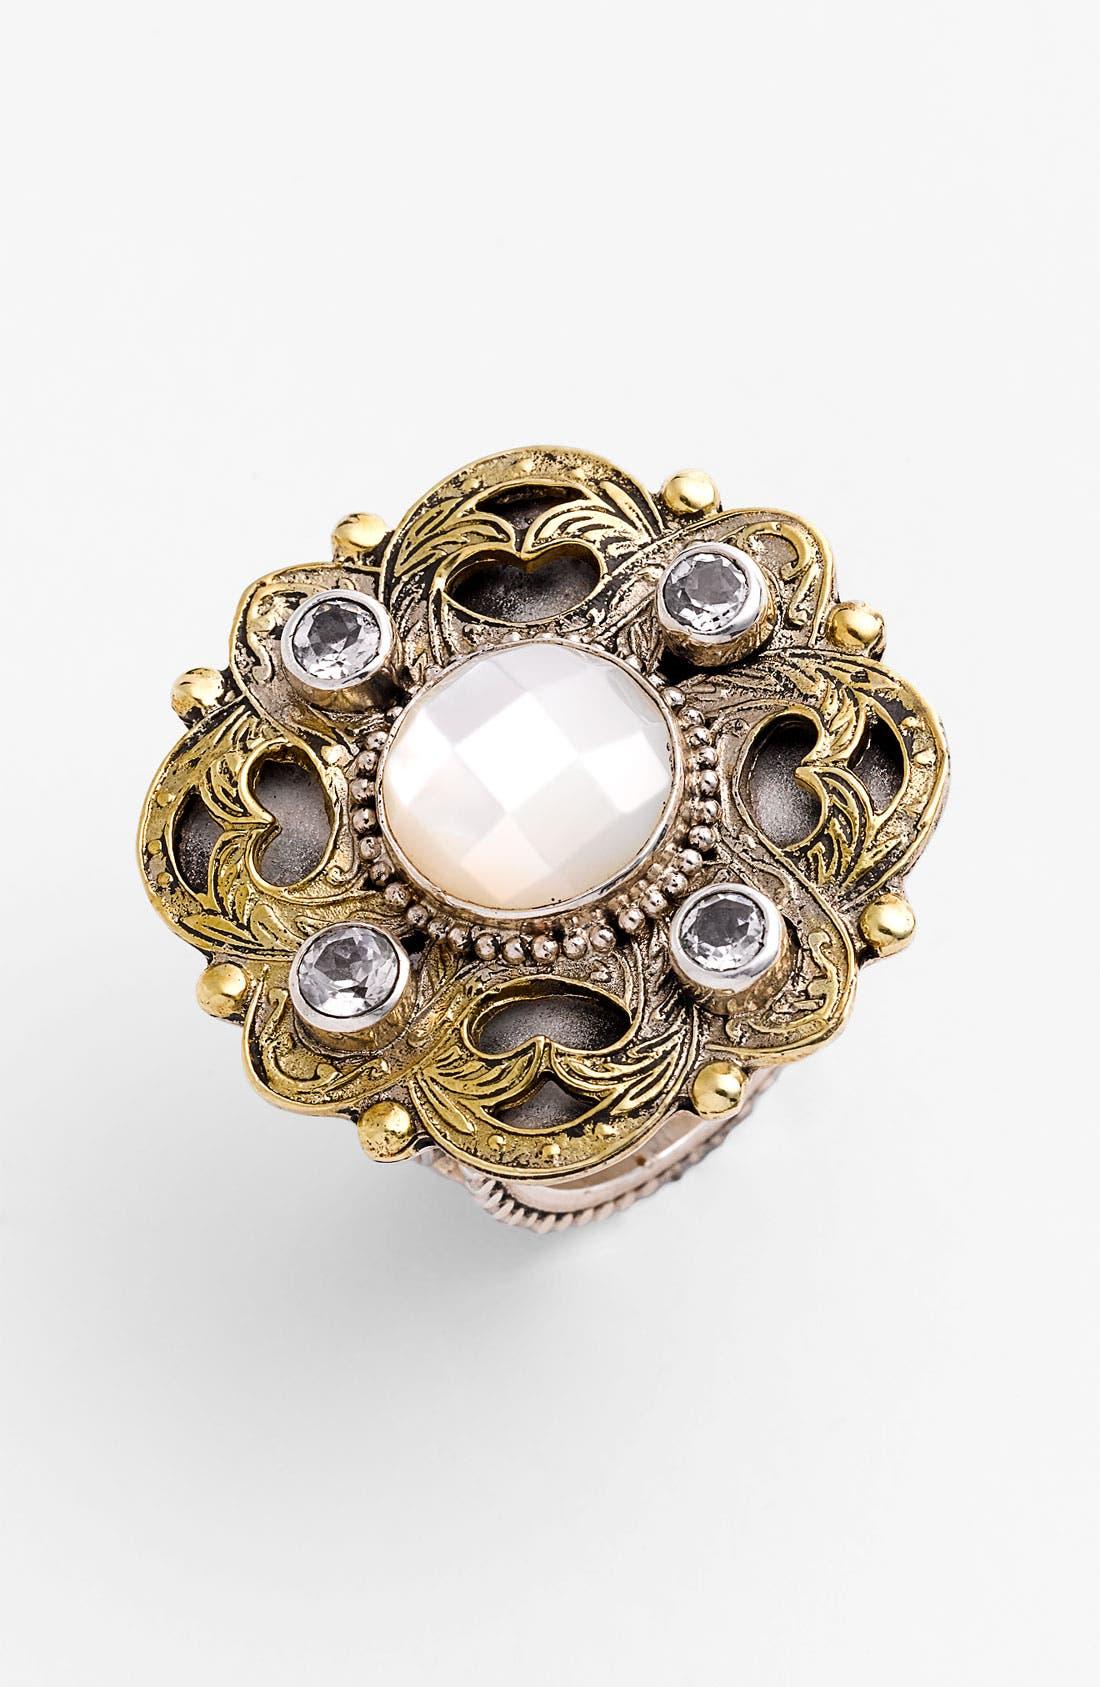 Mars valentine jewelry